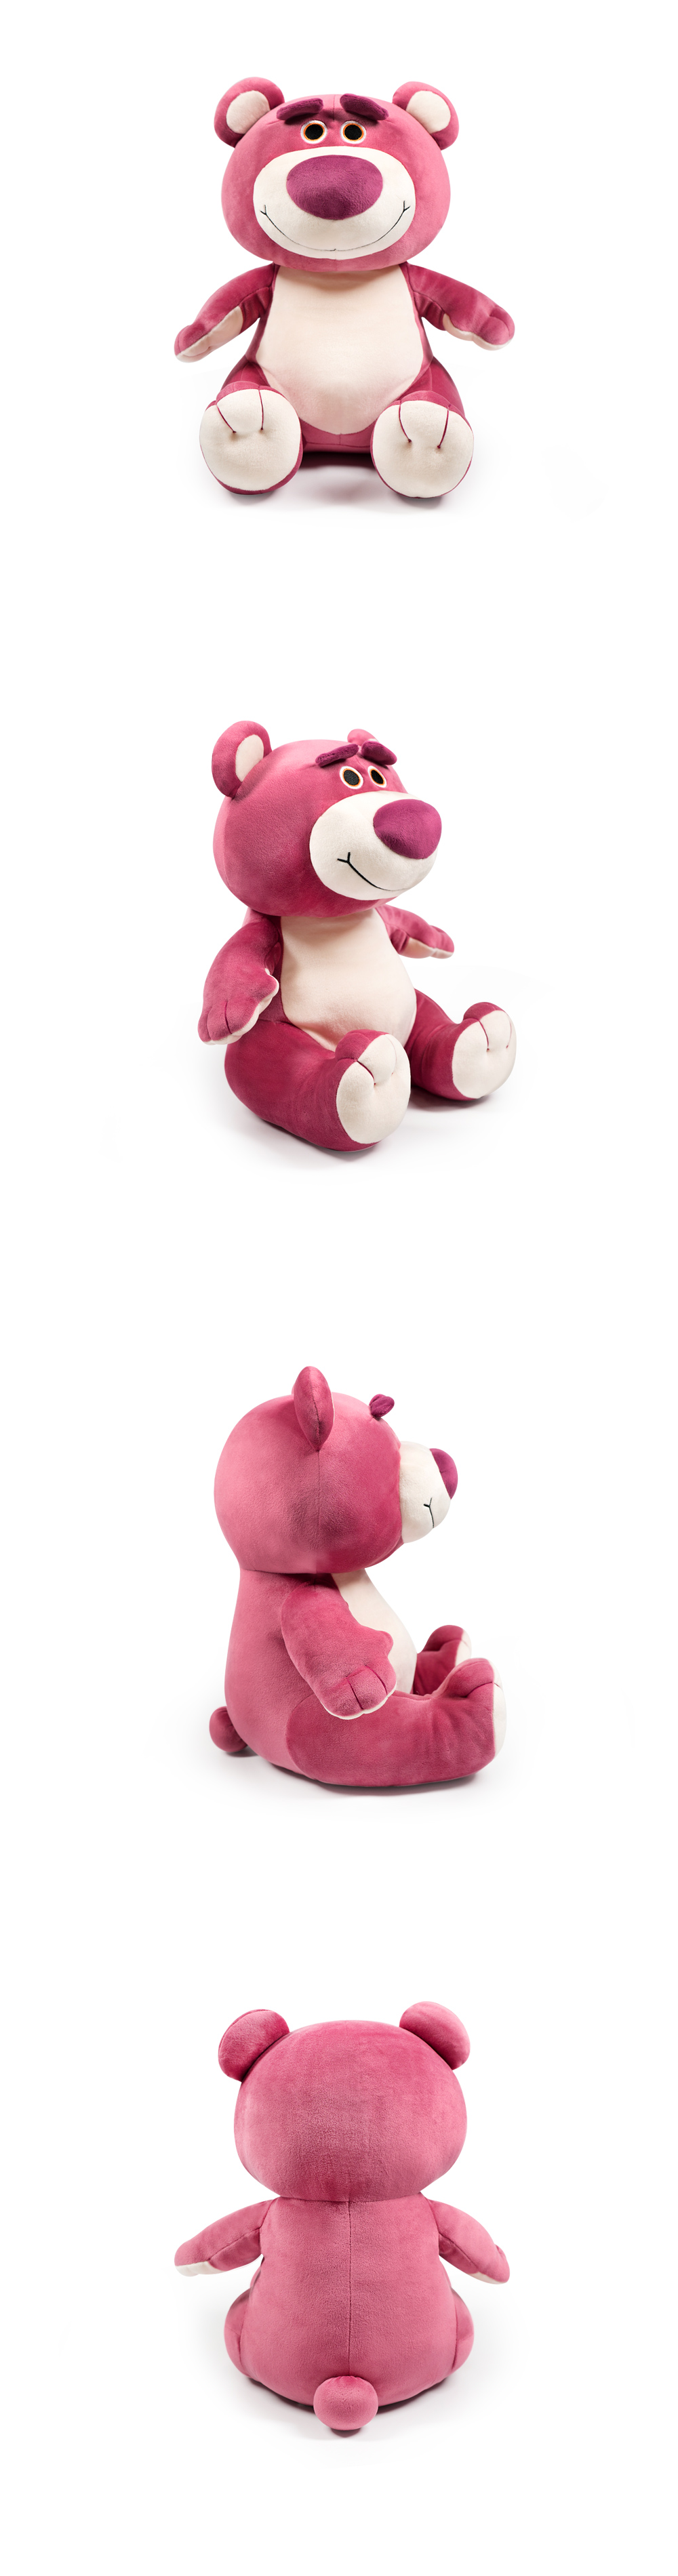 Disney迪士尼 經典系列 熊抱哥 娃娃 35公分